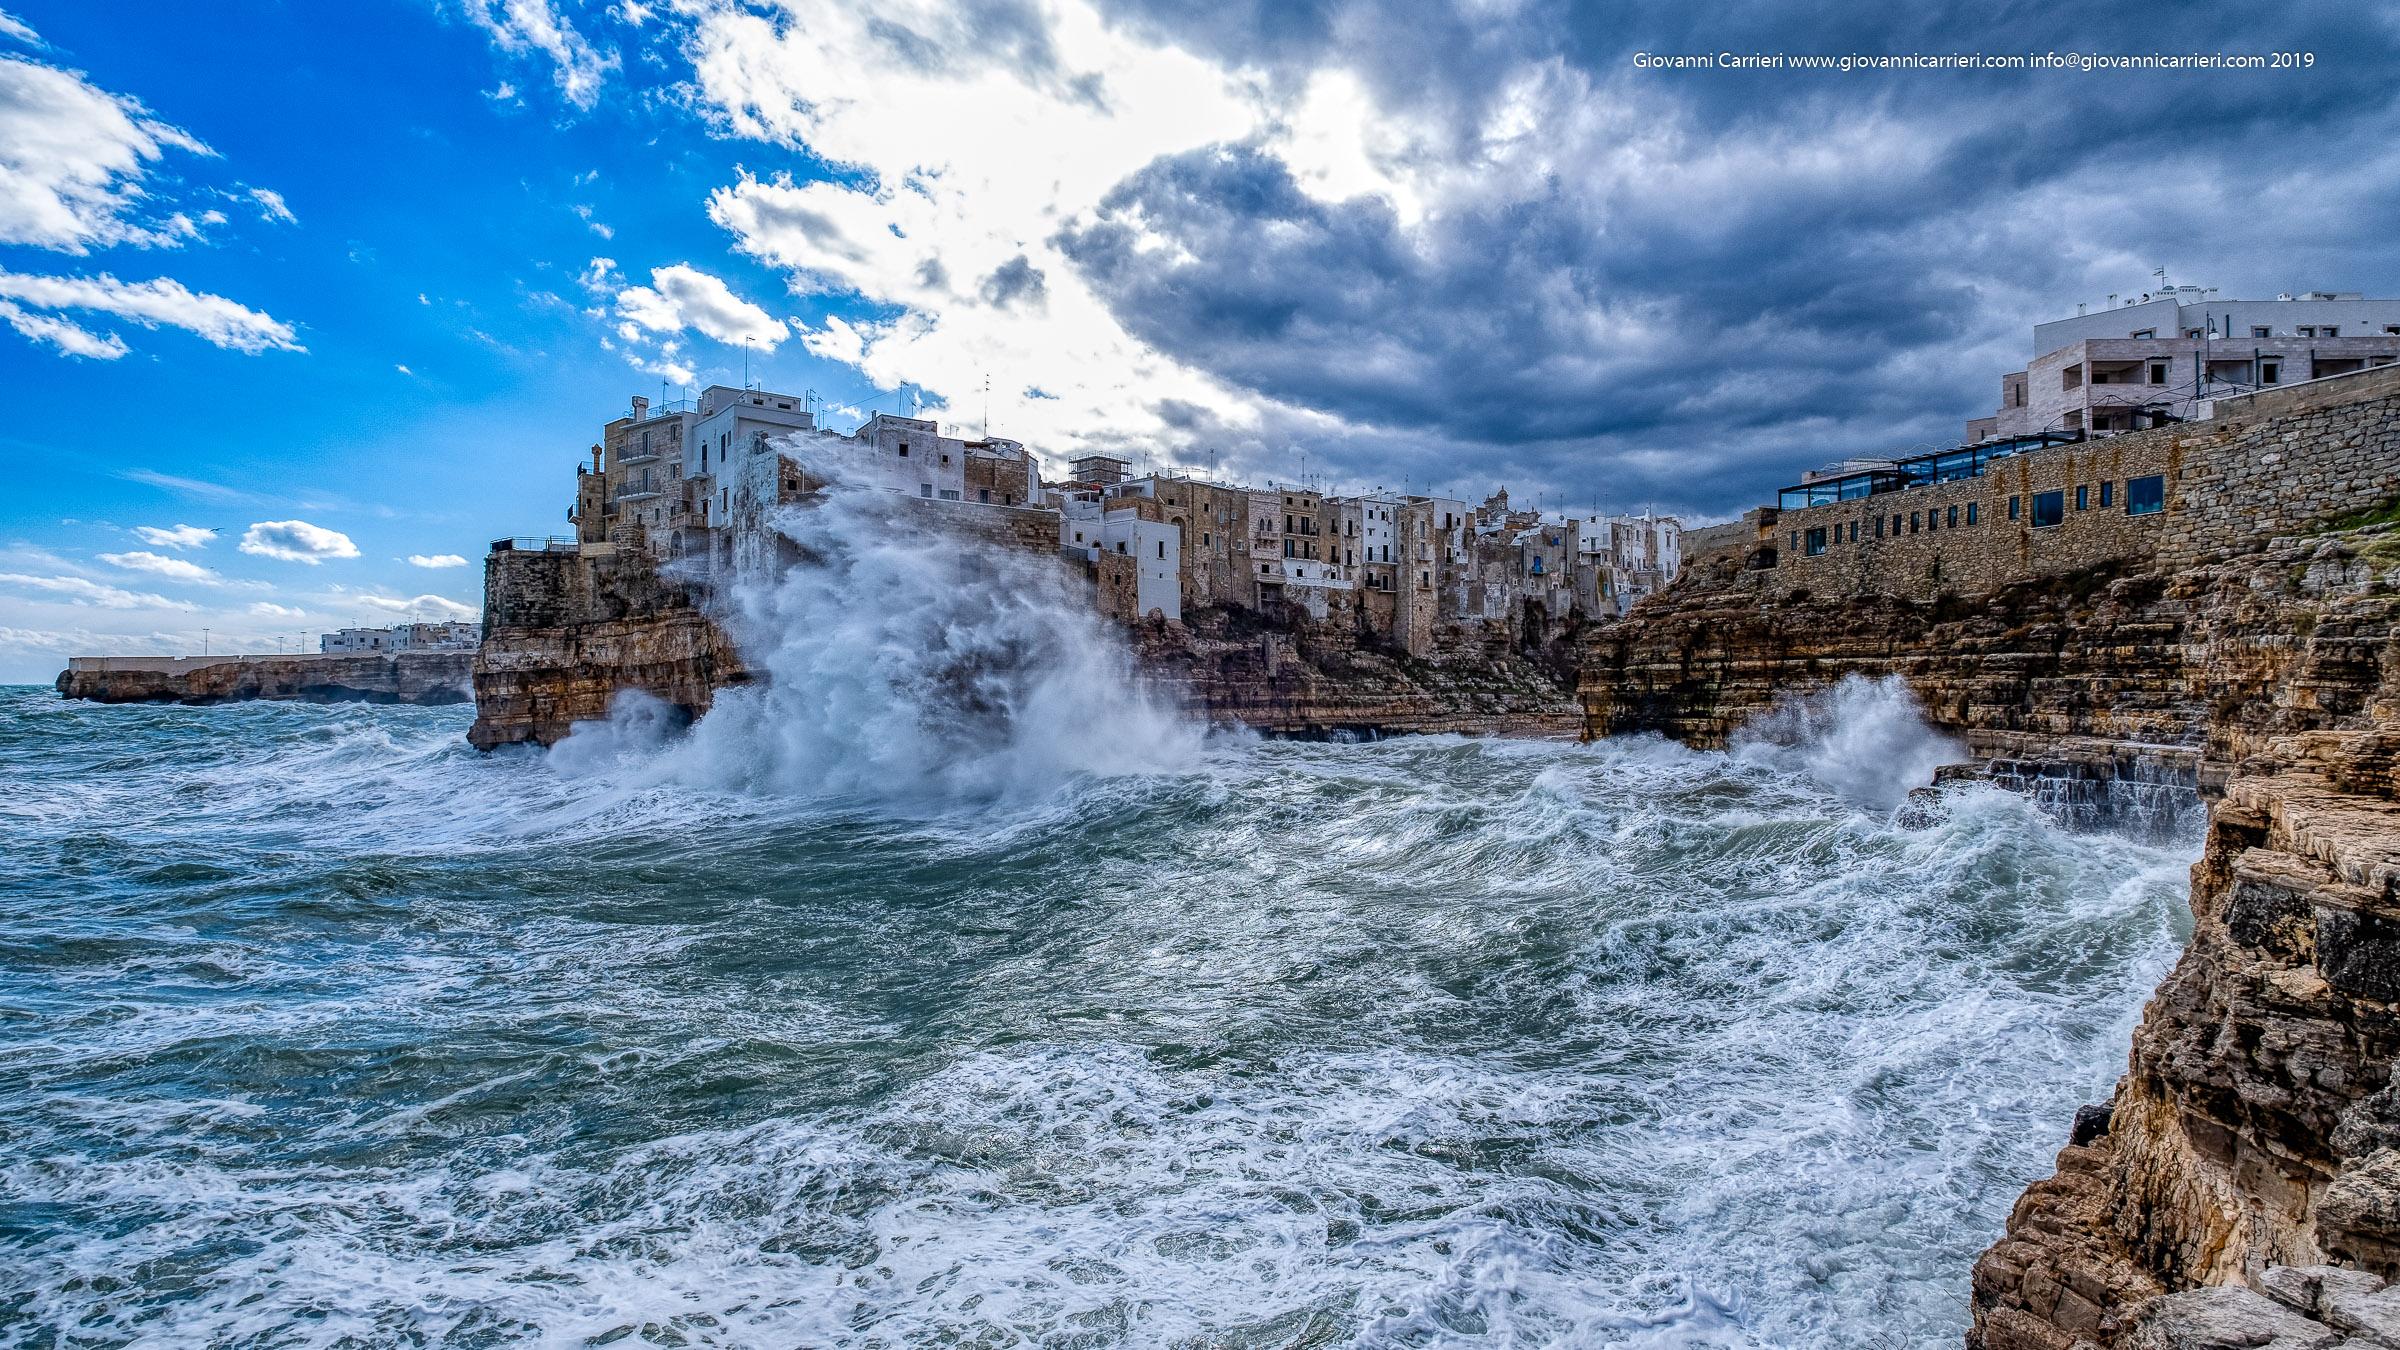 The rough sea on Cala Monachile